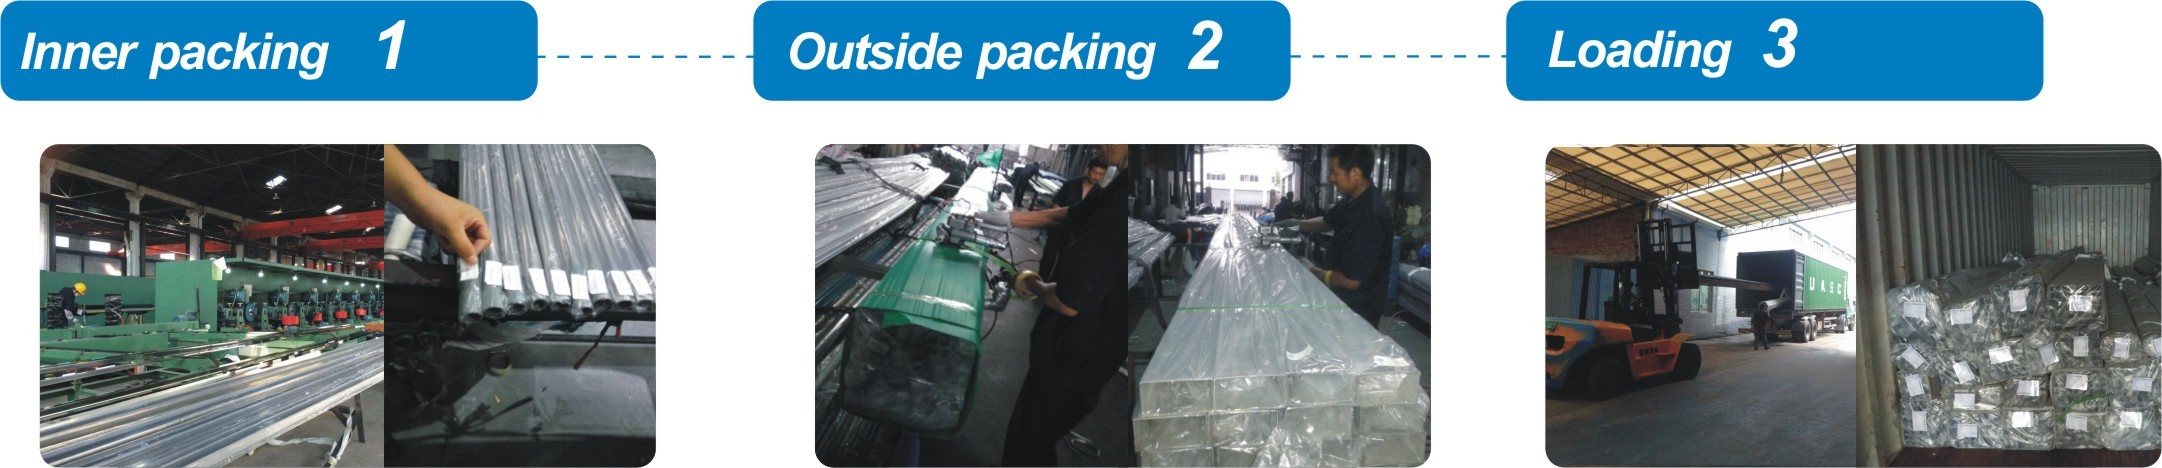 stainless steel tube package